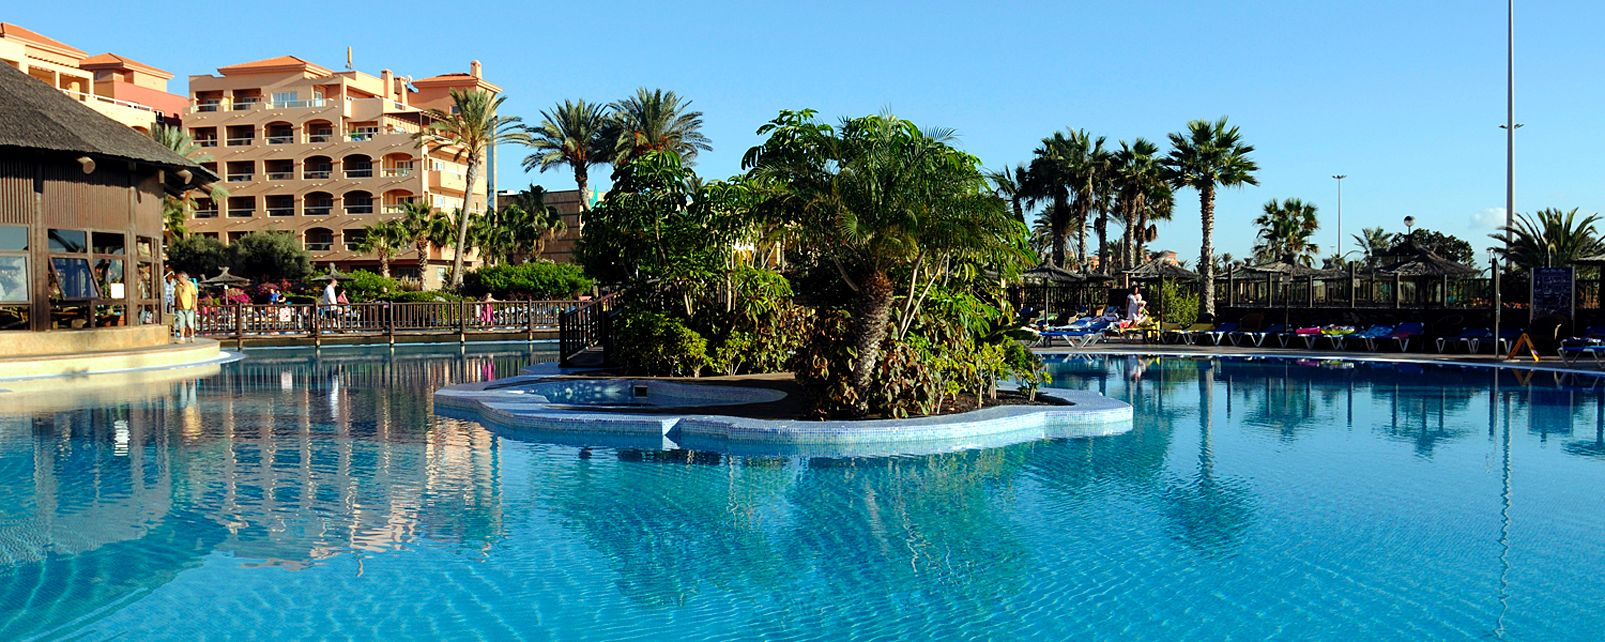 Hotel Elba Sara Beach and Golf Resort